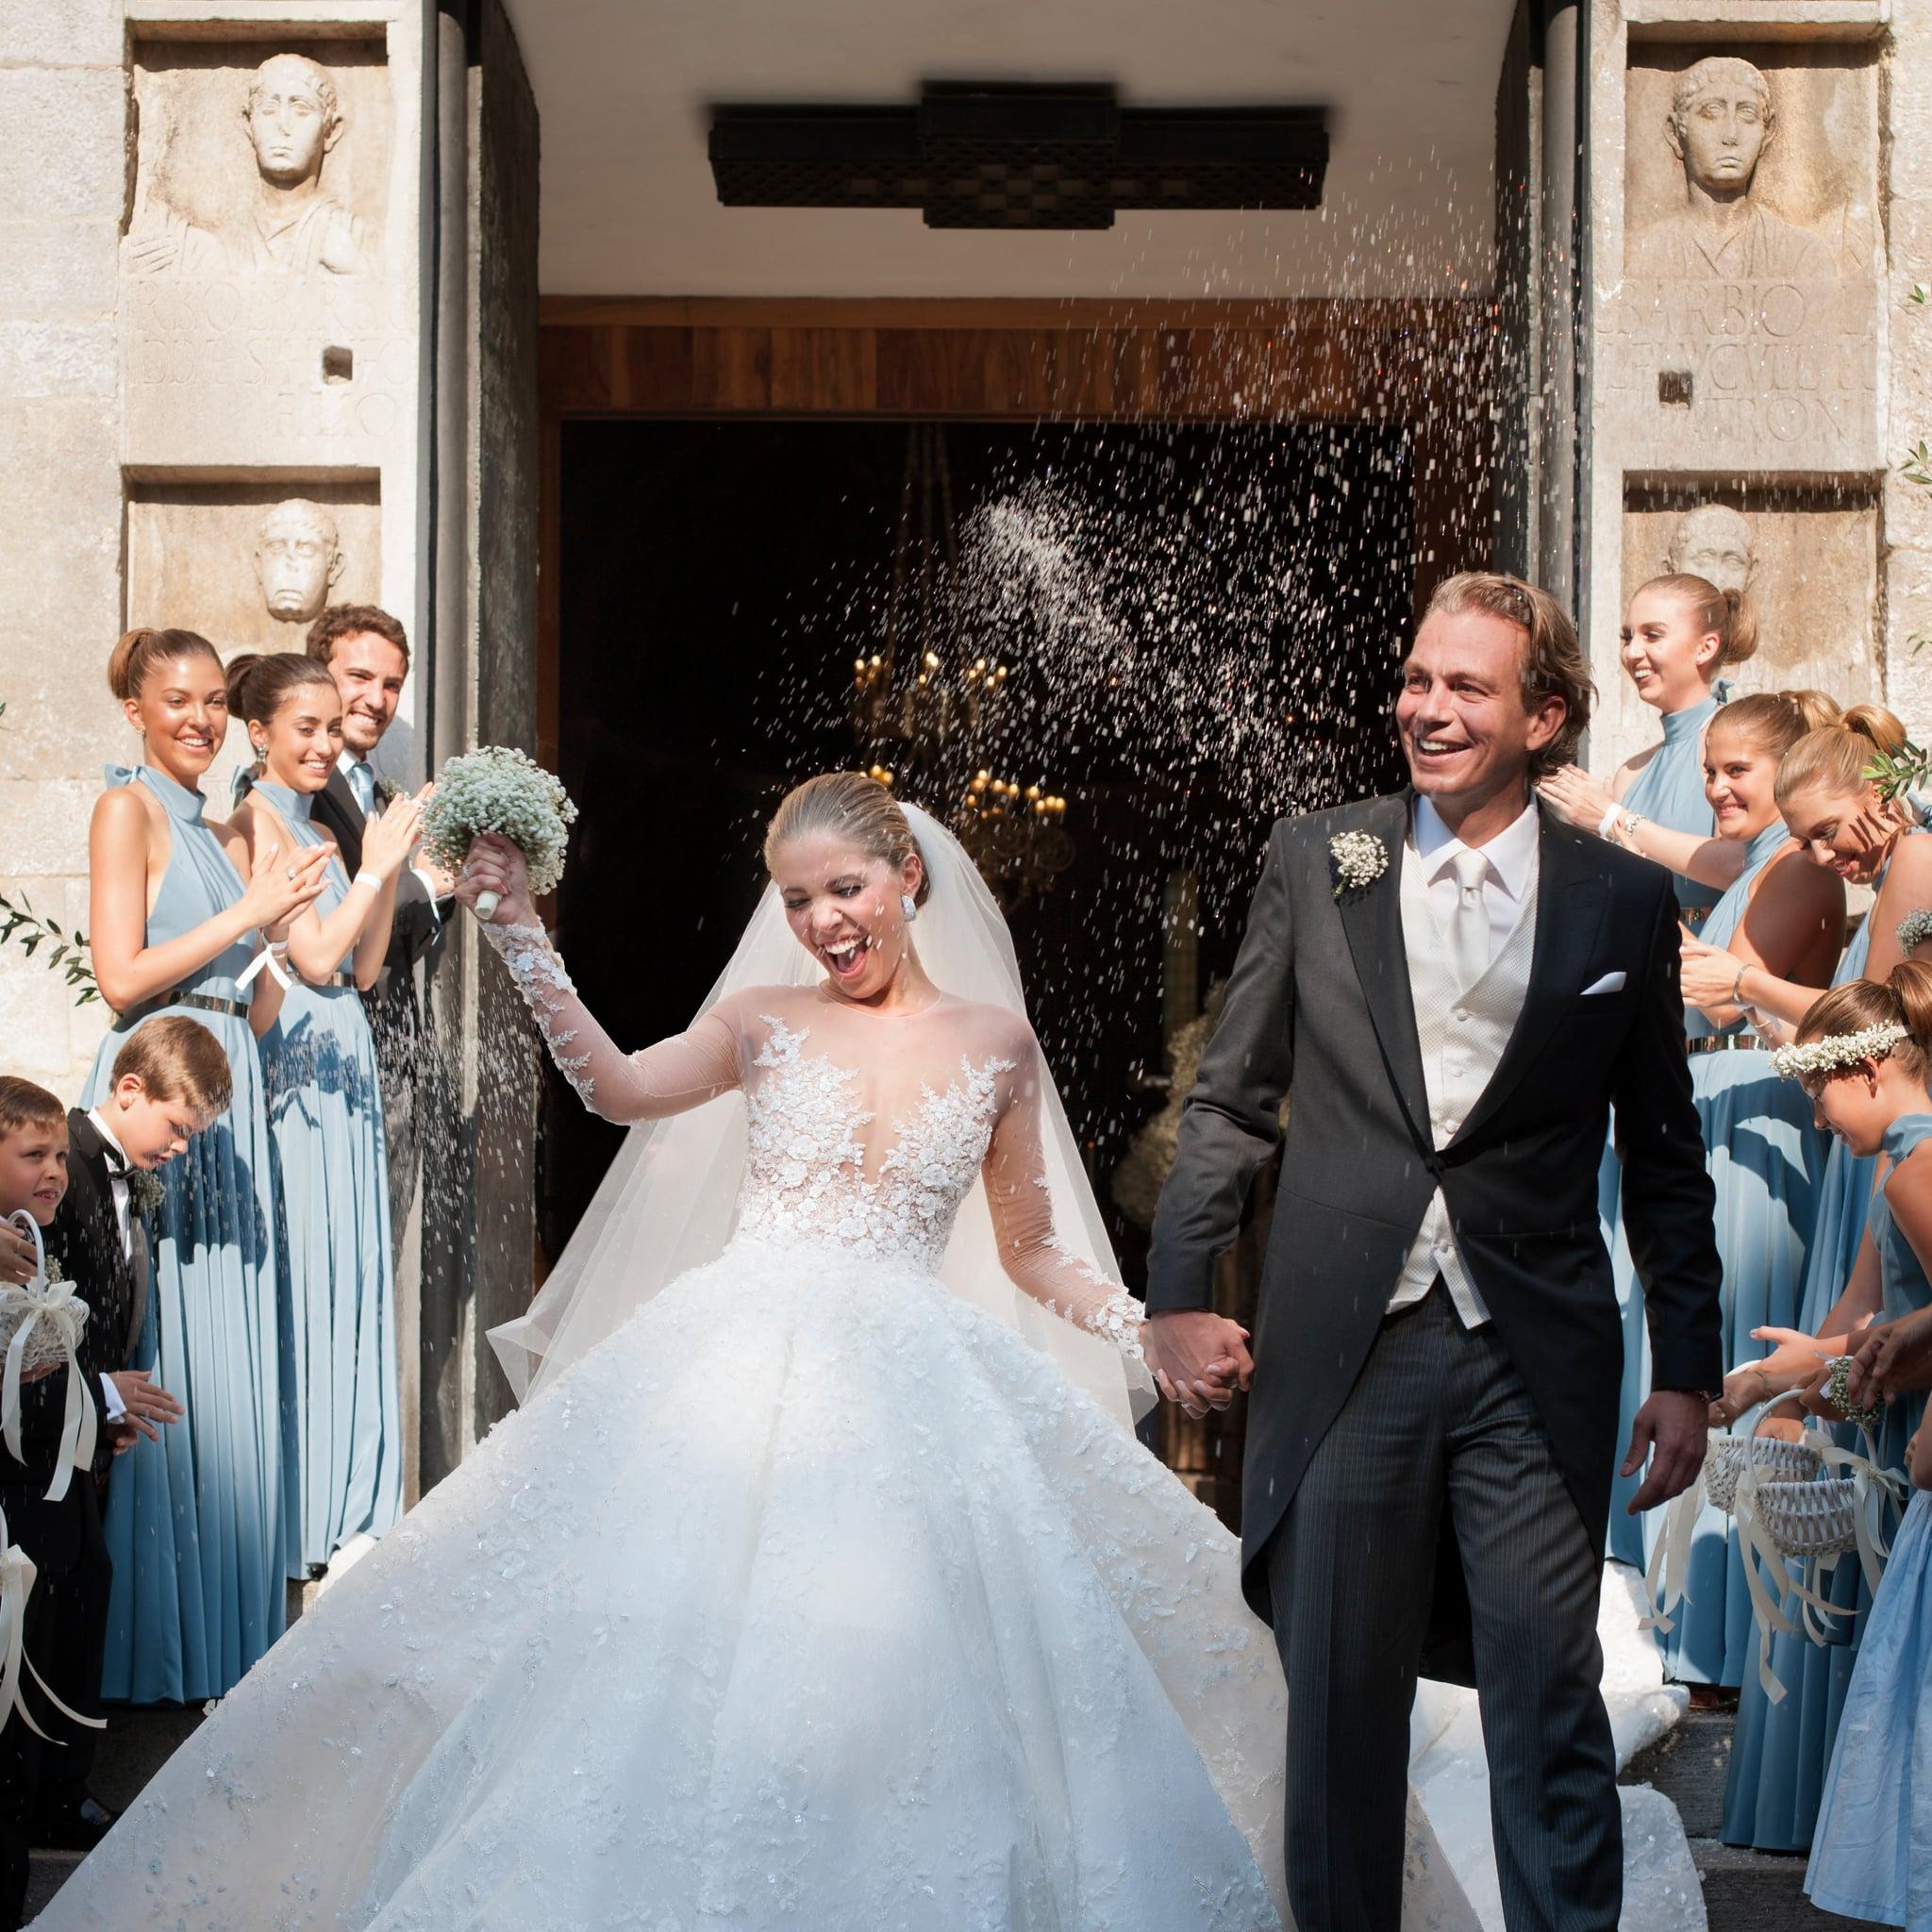 Most Extravagant Wedding Dresses of 2017 POPSUGAR Fashion